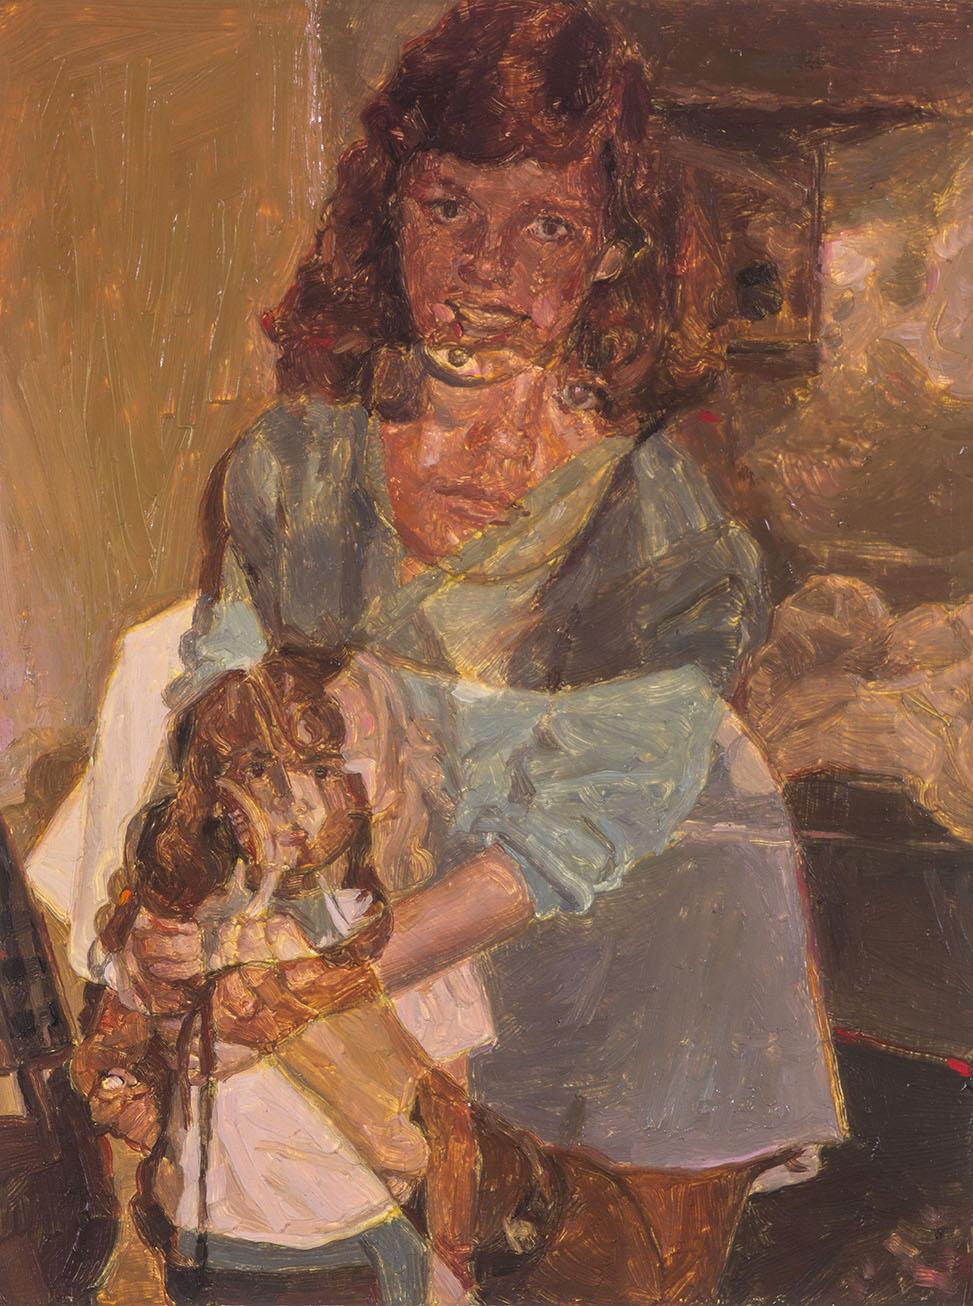 Copy of Cell Division (Susan and Julie Fragar) (detail), oil on paper, 67.5 x 50 cm (image 11.5 x 8.5 cm), 2016. (Sarah Cottier Gallery)